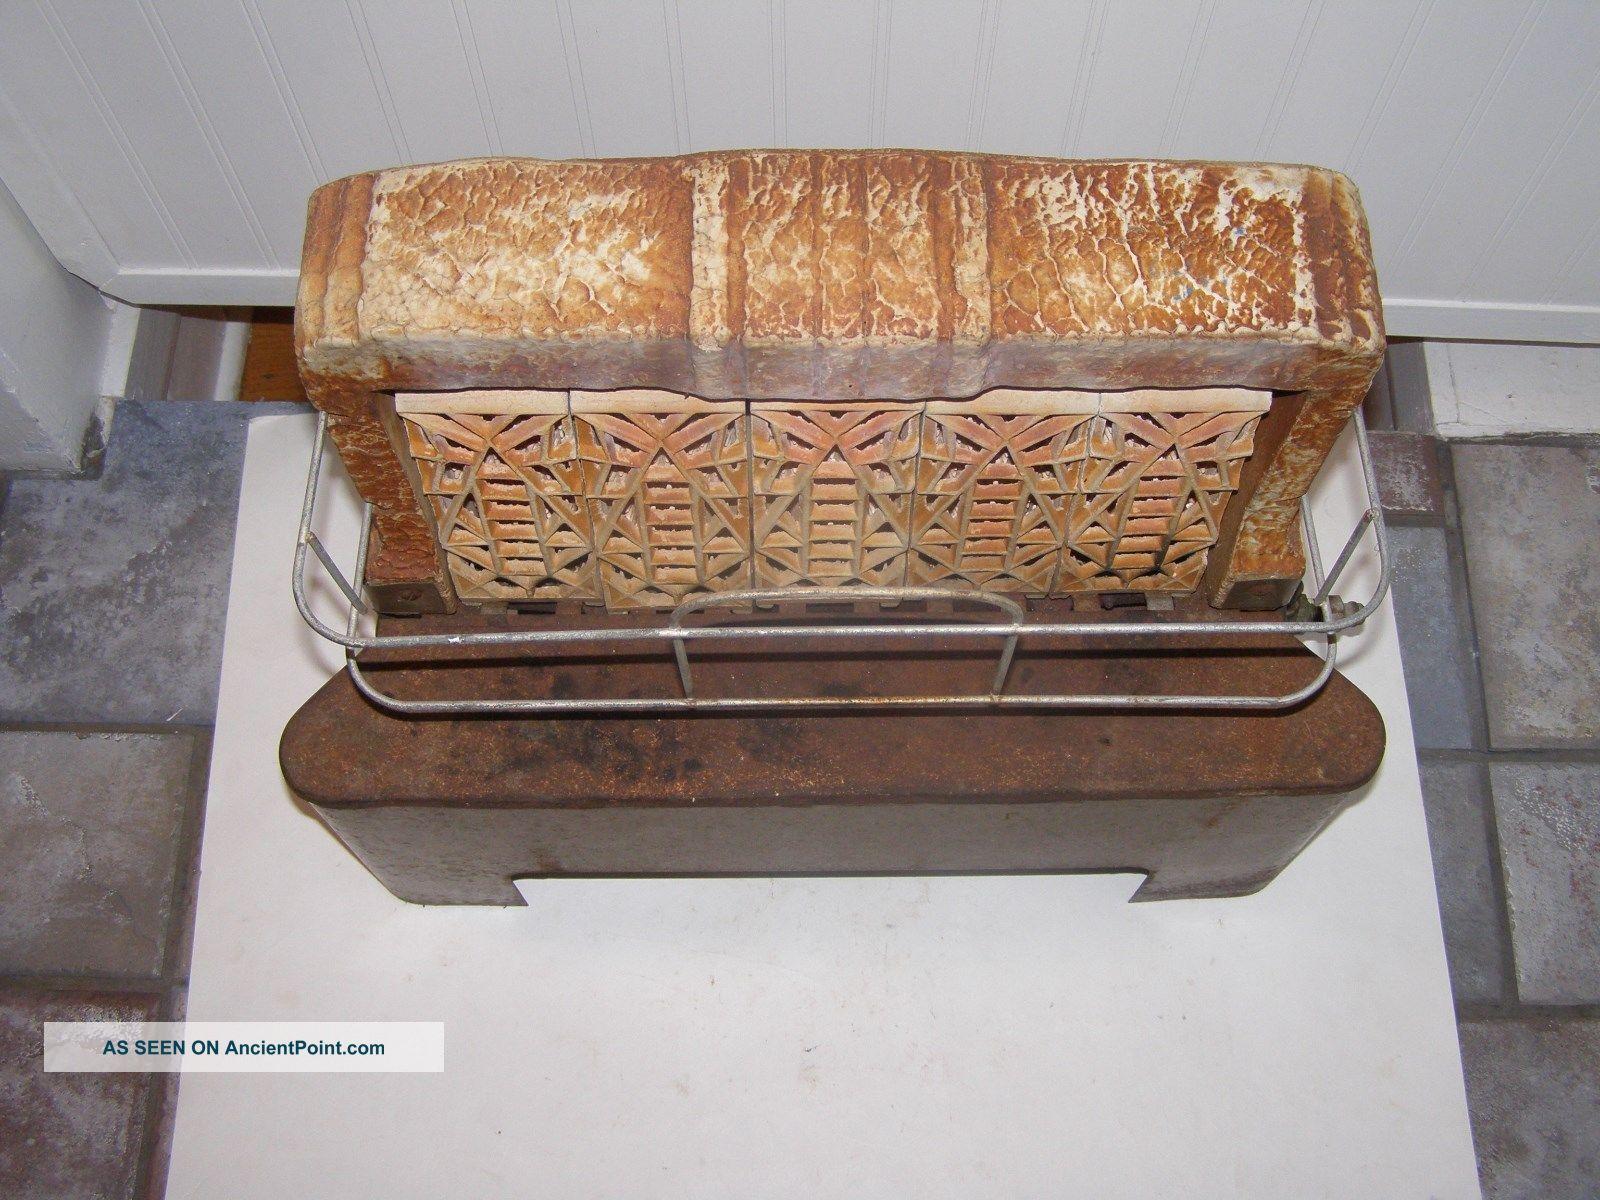 Vintage Imperial Natural Gas Radiant Heater Ceramic Grates